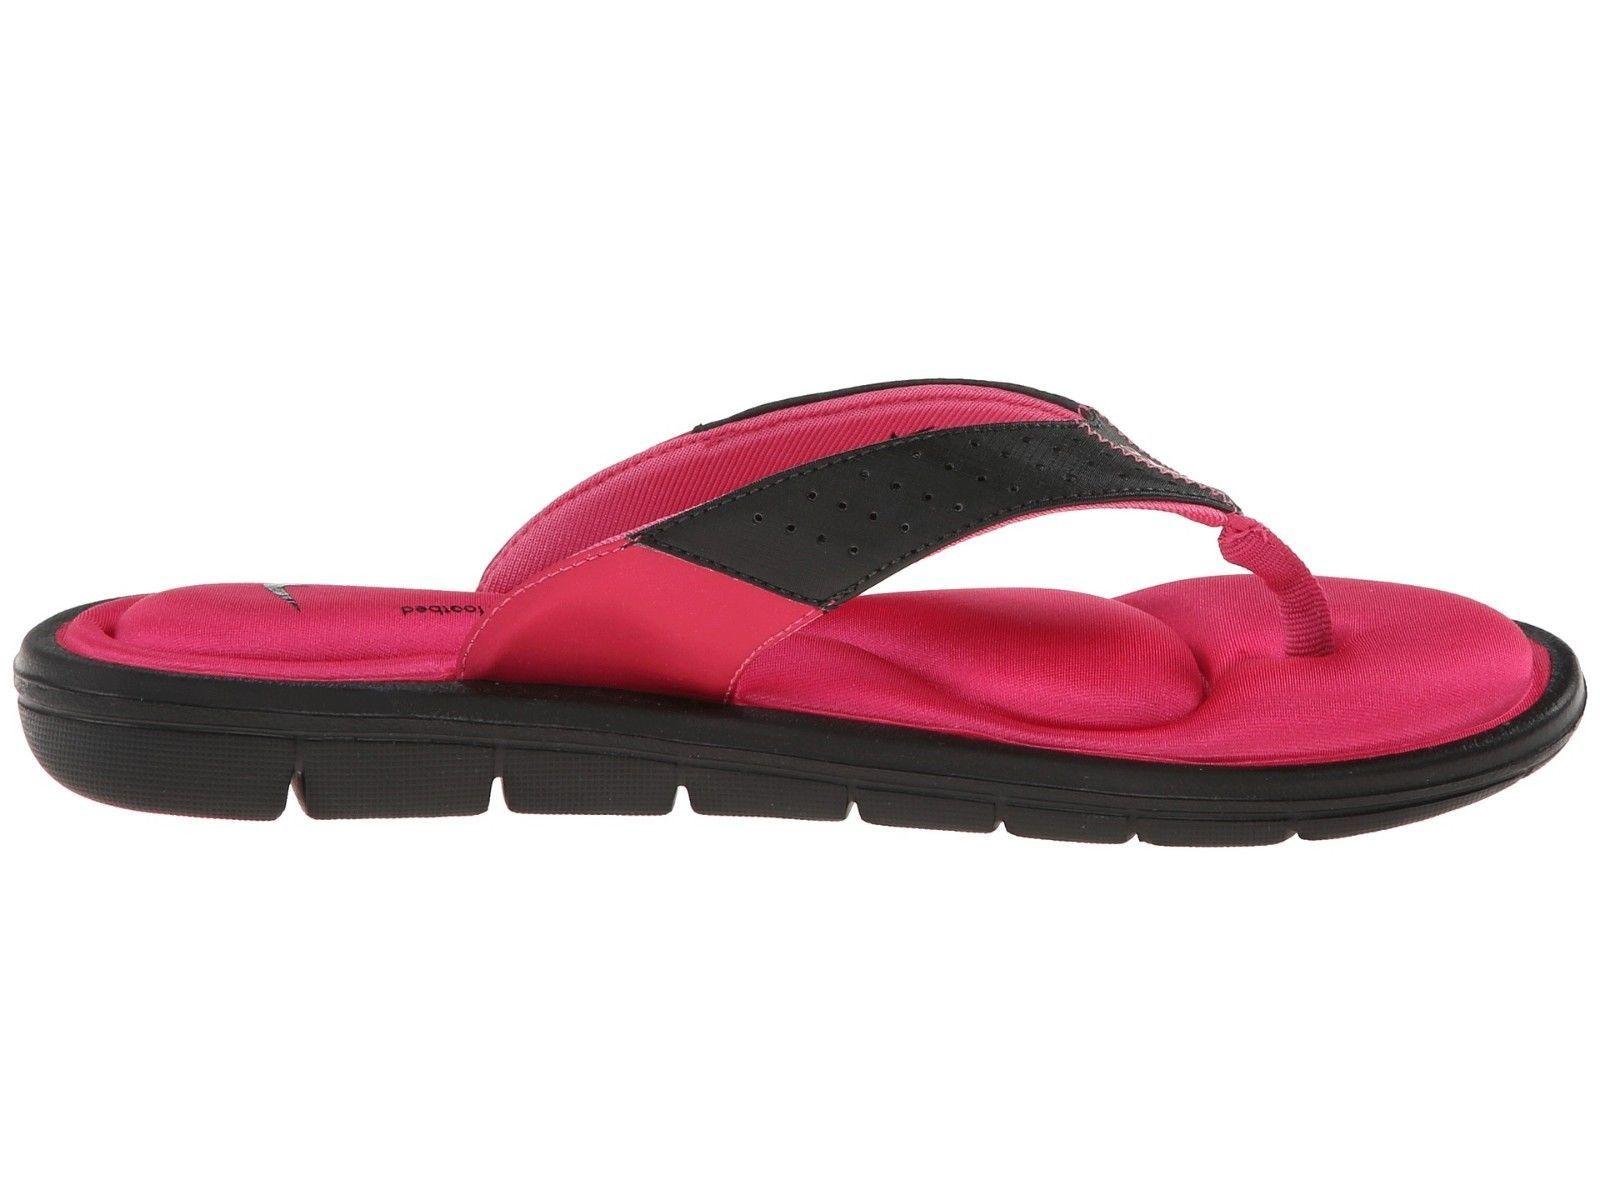 1027e26044b Women s Nike Comfort Thong Sandals